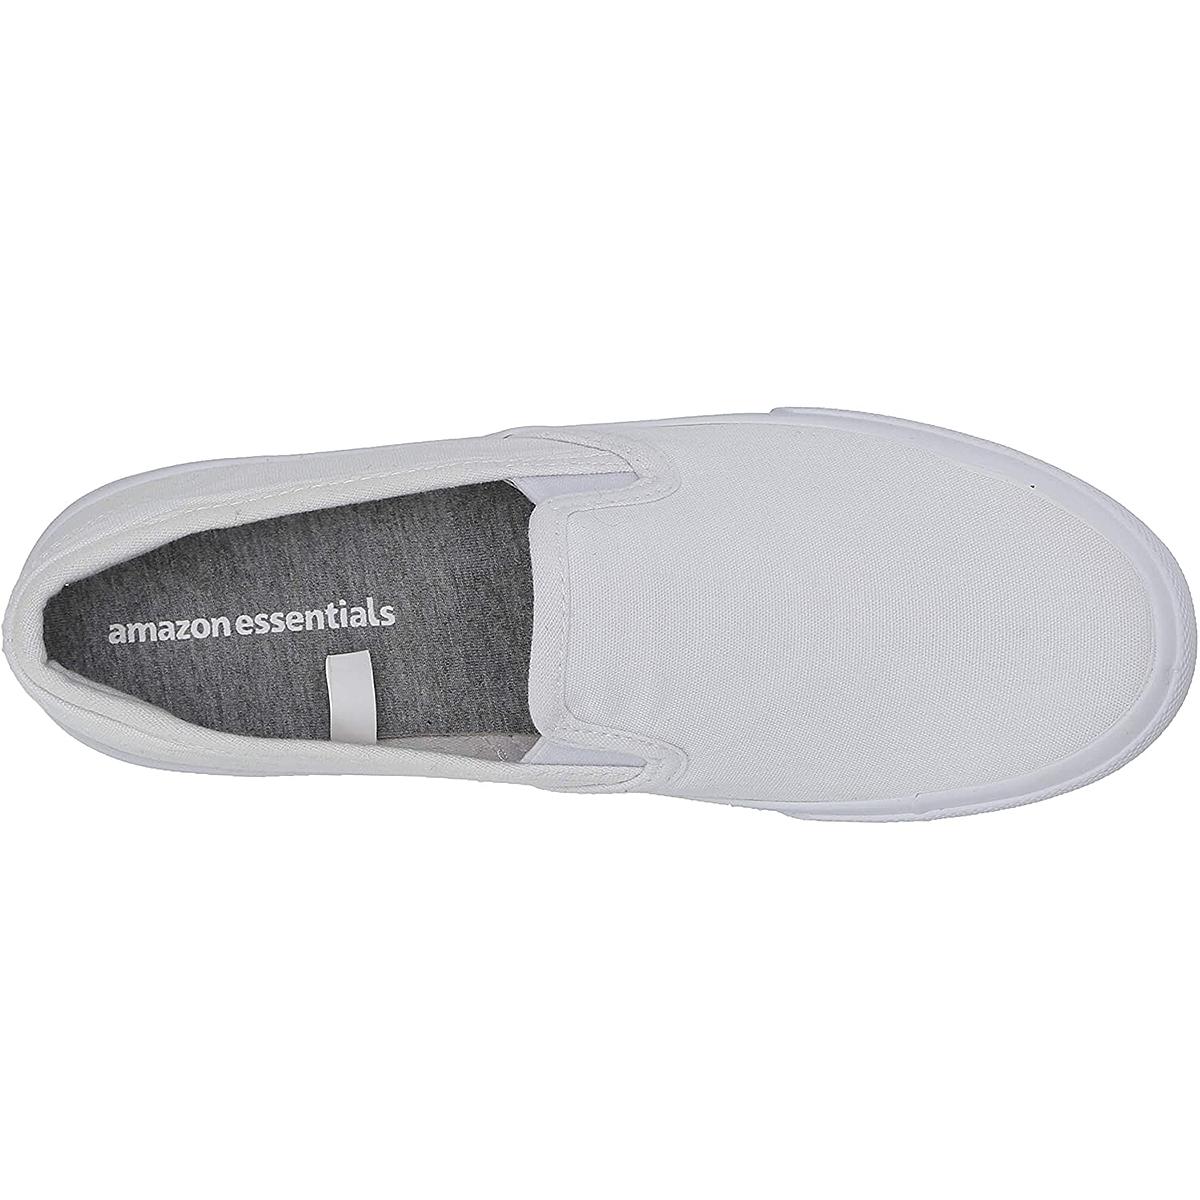 amazon-essentials-white-slip-on-sneaker1